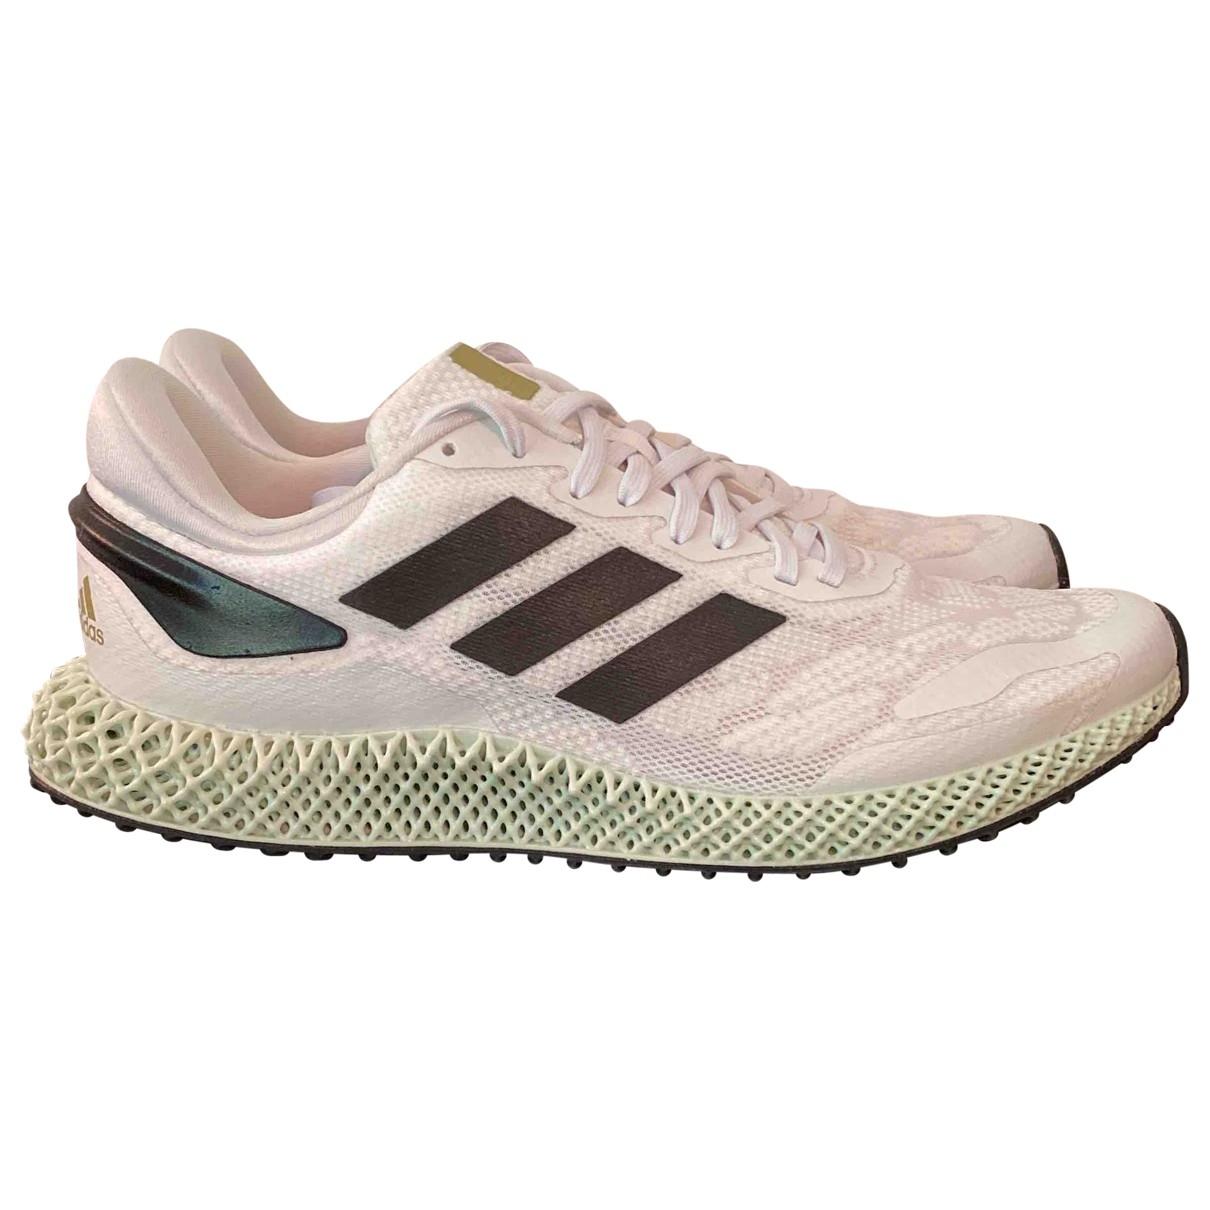 Adidas \N Sneakers in  Weiss Leinen